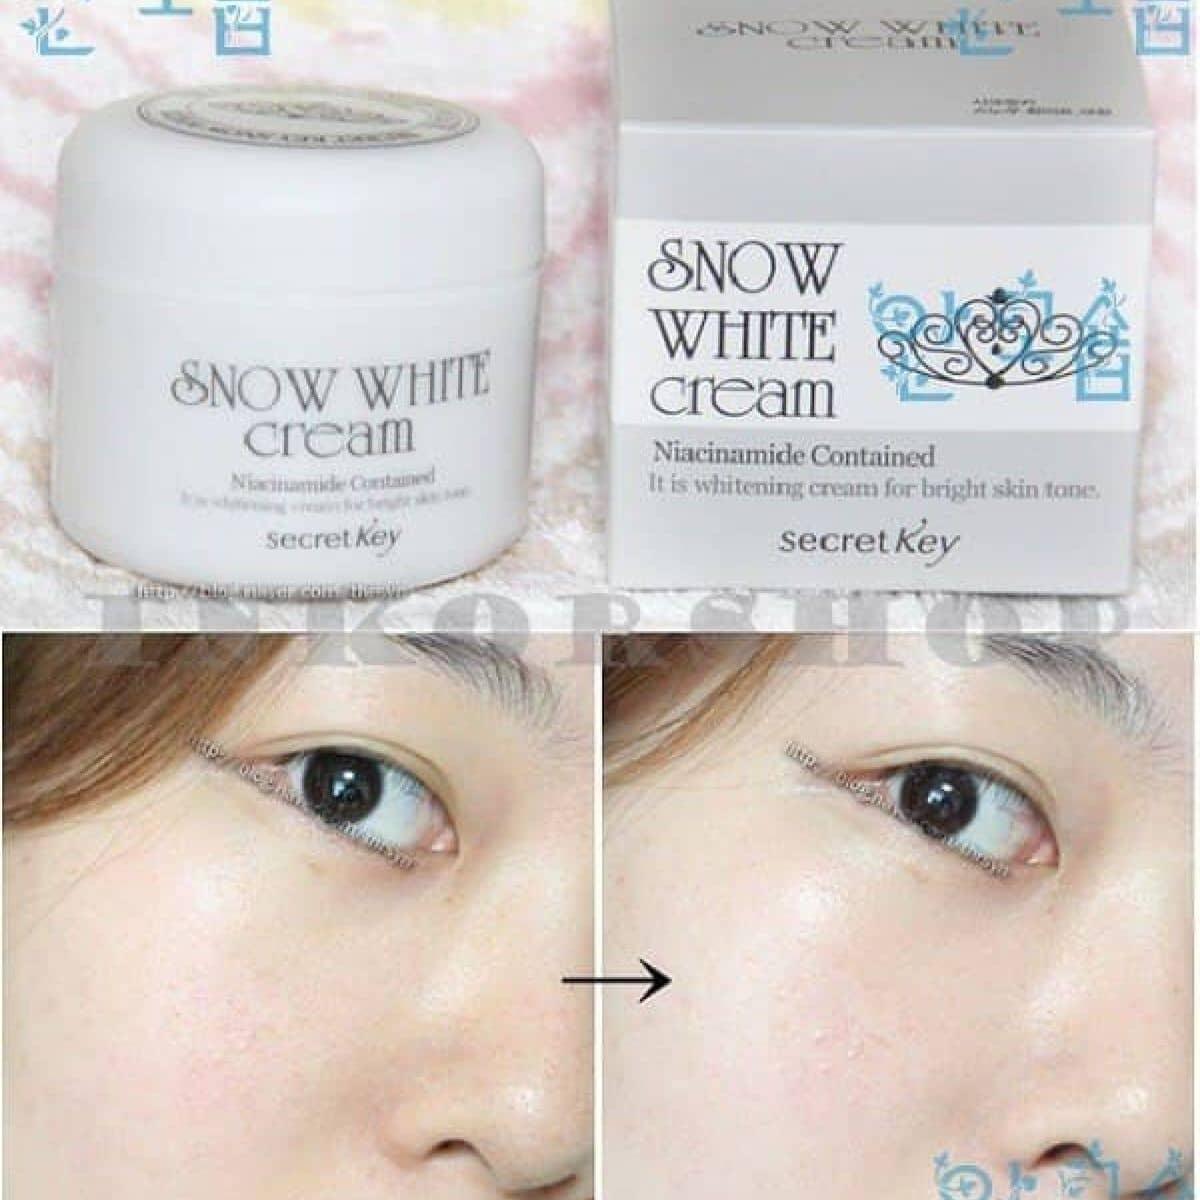 Snow White Cream Secret Key Ti H Hc Lm Bnh Tn Tphcm Ca Nhinguyen Lozi